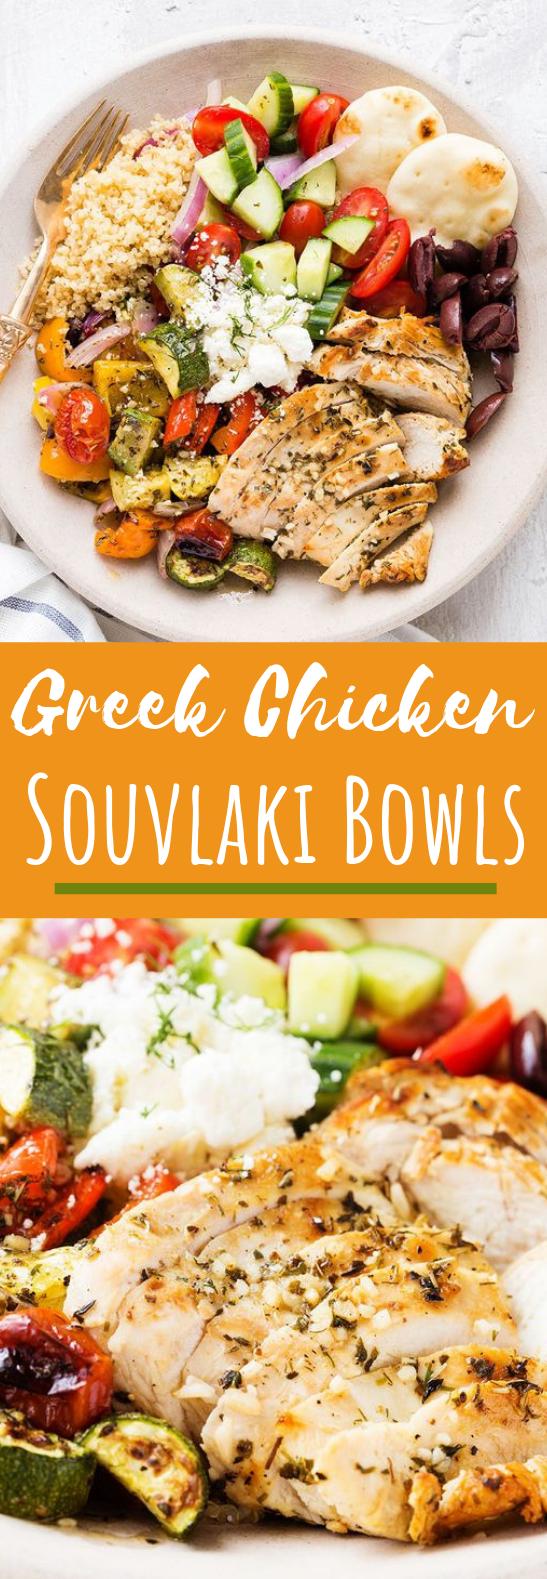 Greek Chicken Souvlaki Bowl #healthy #recipes